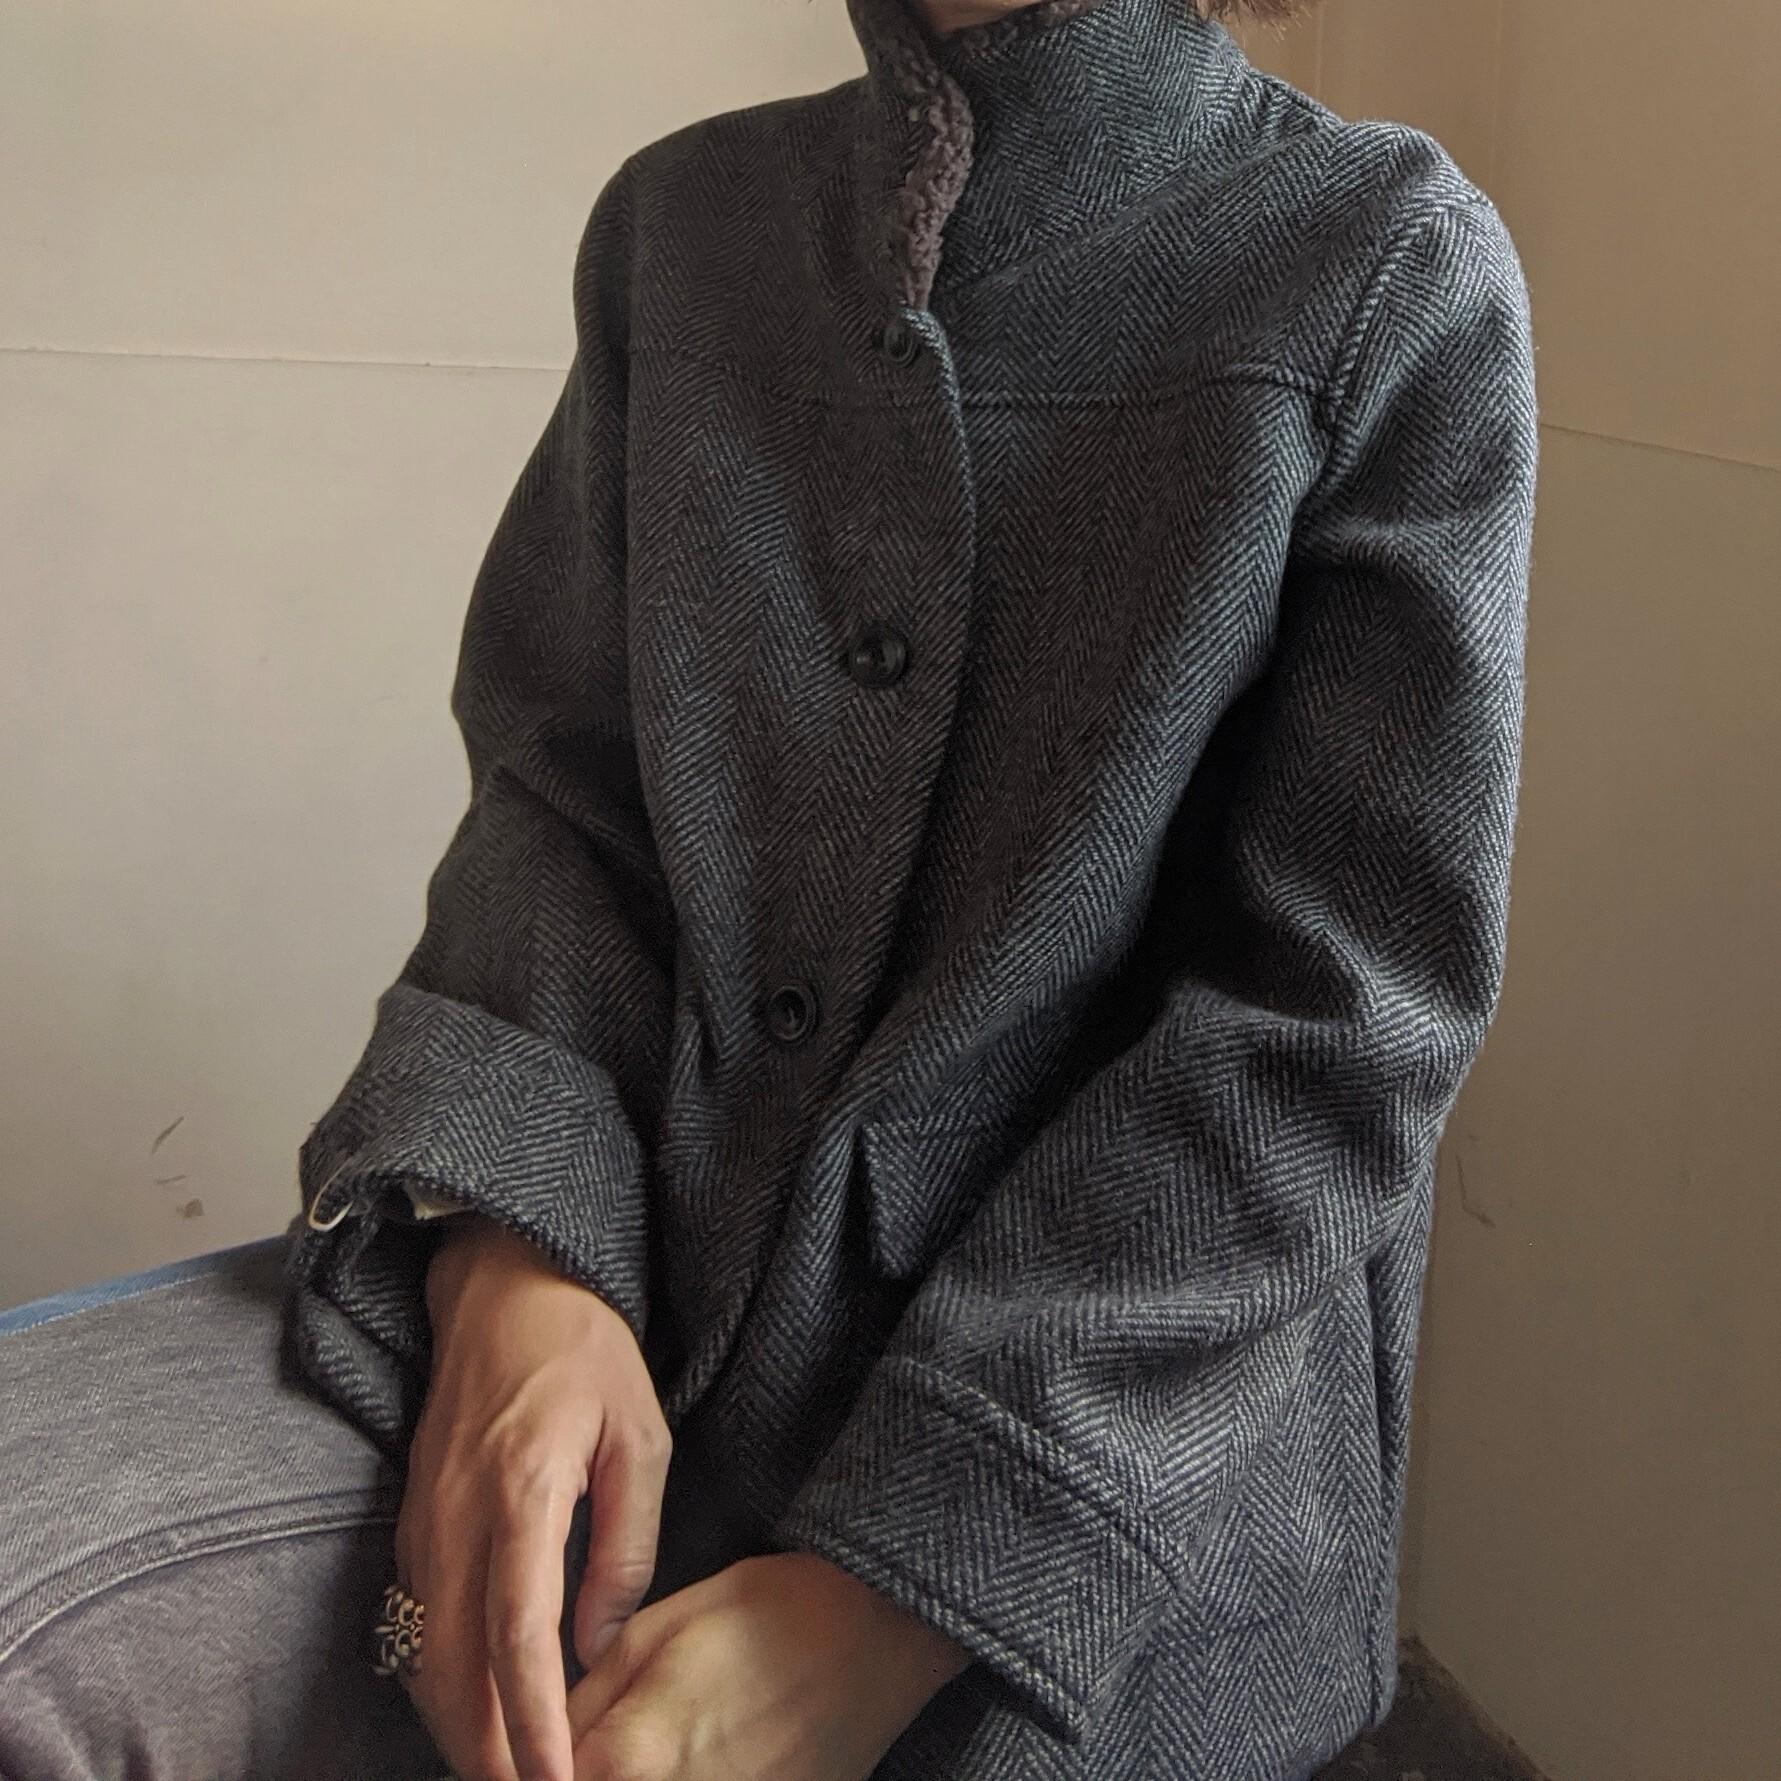 【 Dana Faneuil 】 ダナファヌル ダブルフェイスツウィードヘリンボンジャケット / グレーブラック Mサイズ